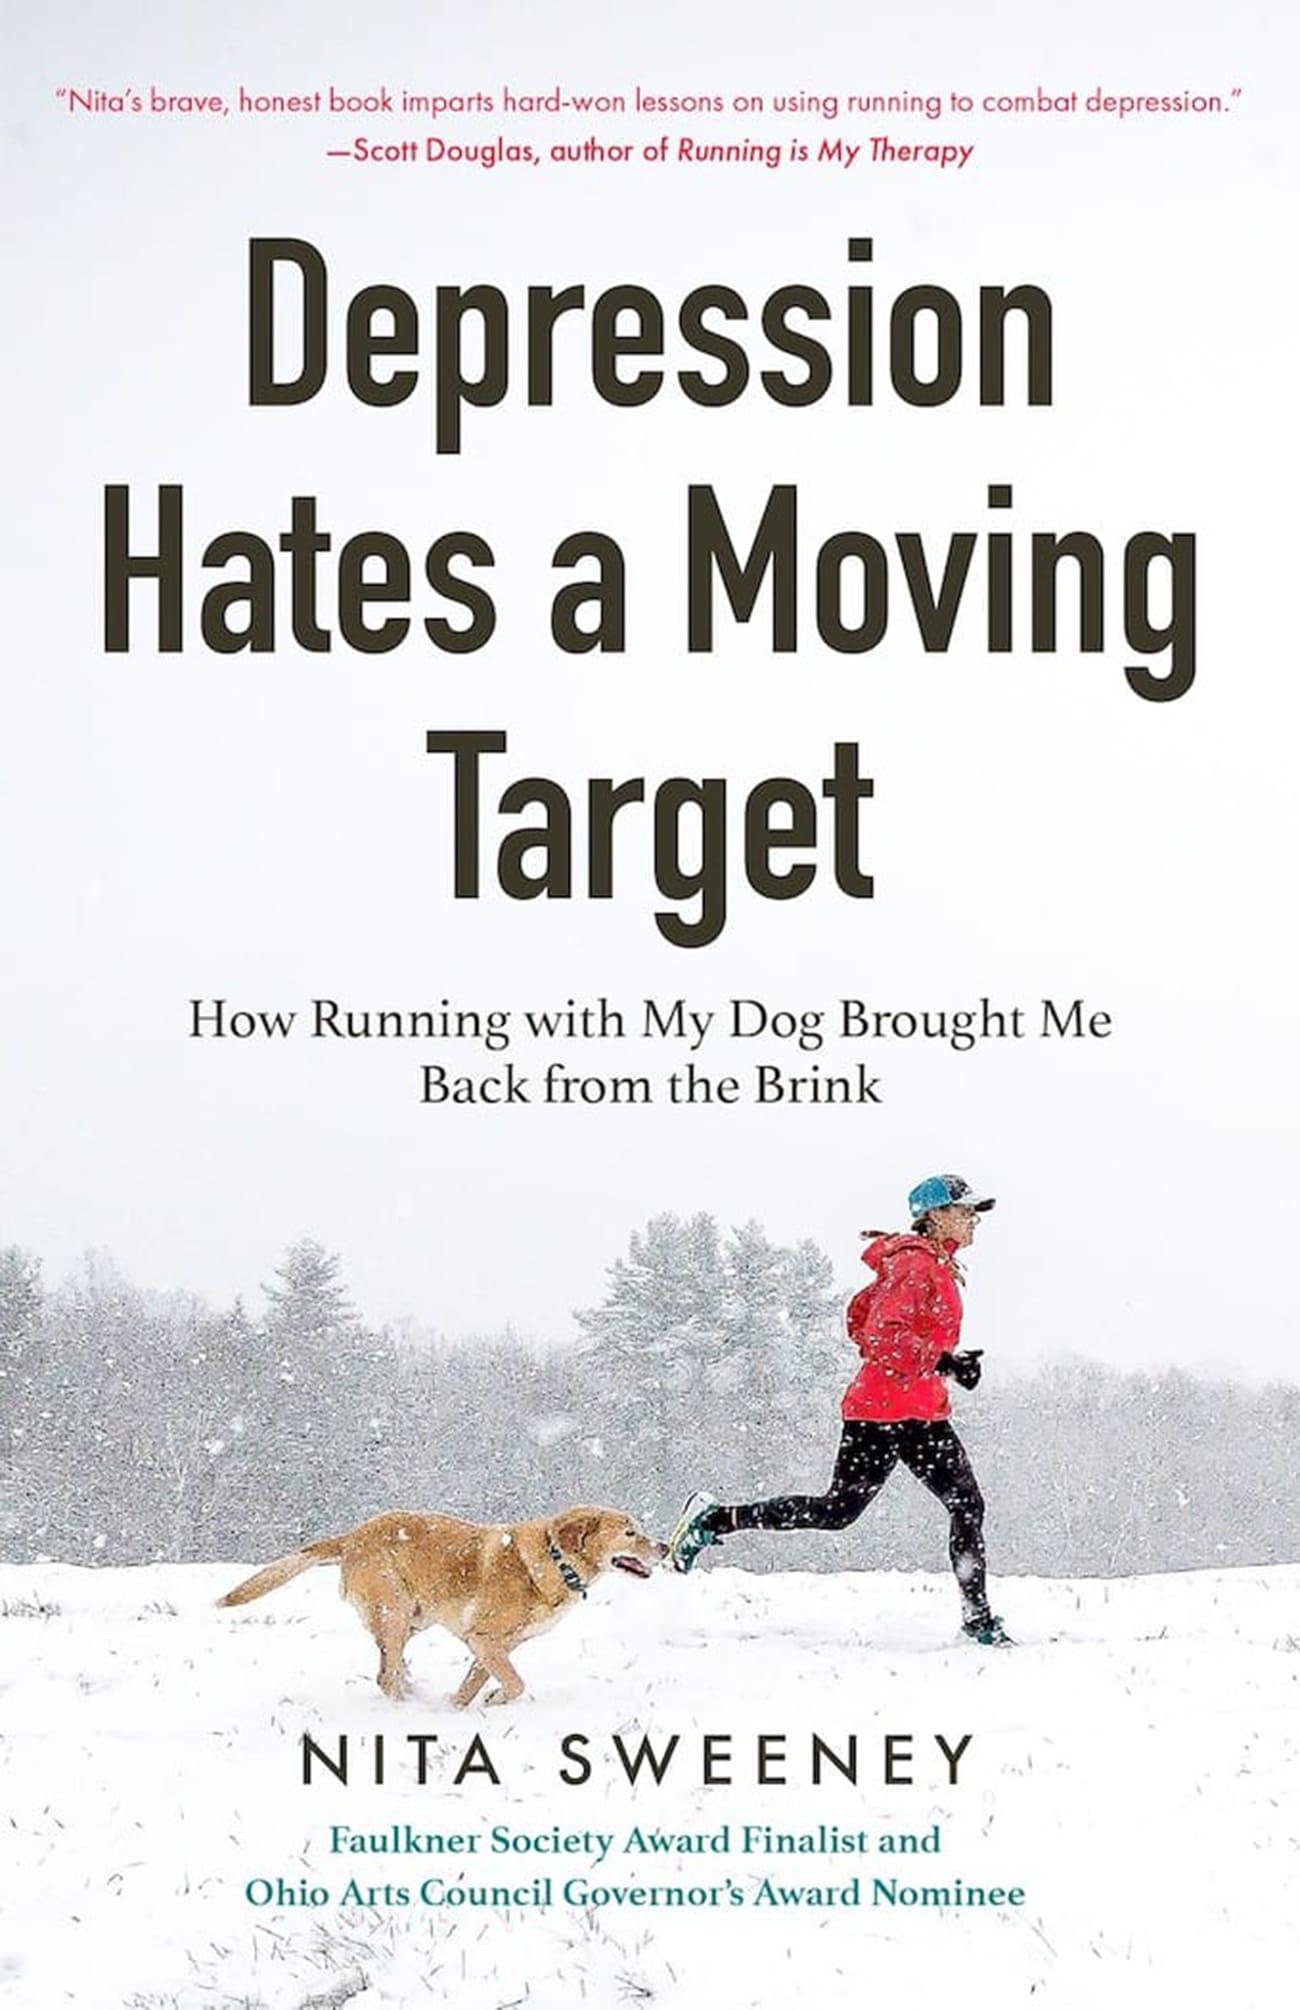 DepressionHatesAMovingTarget